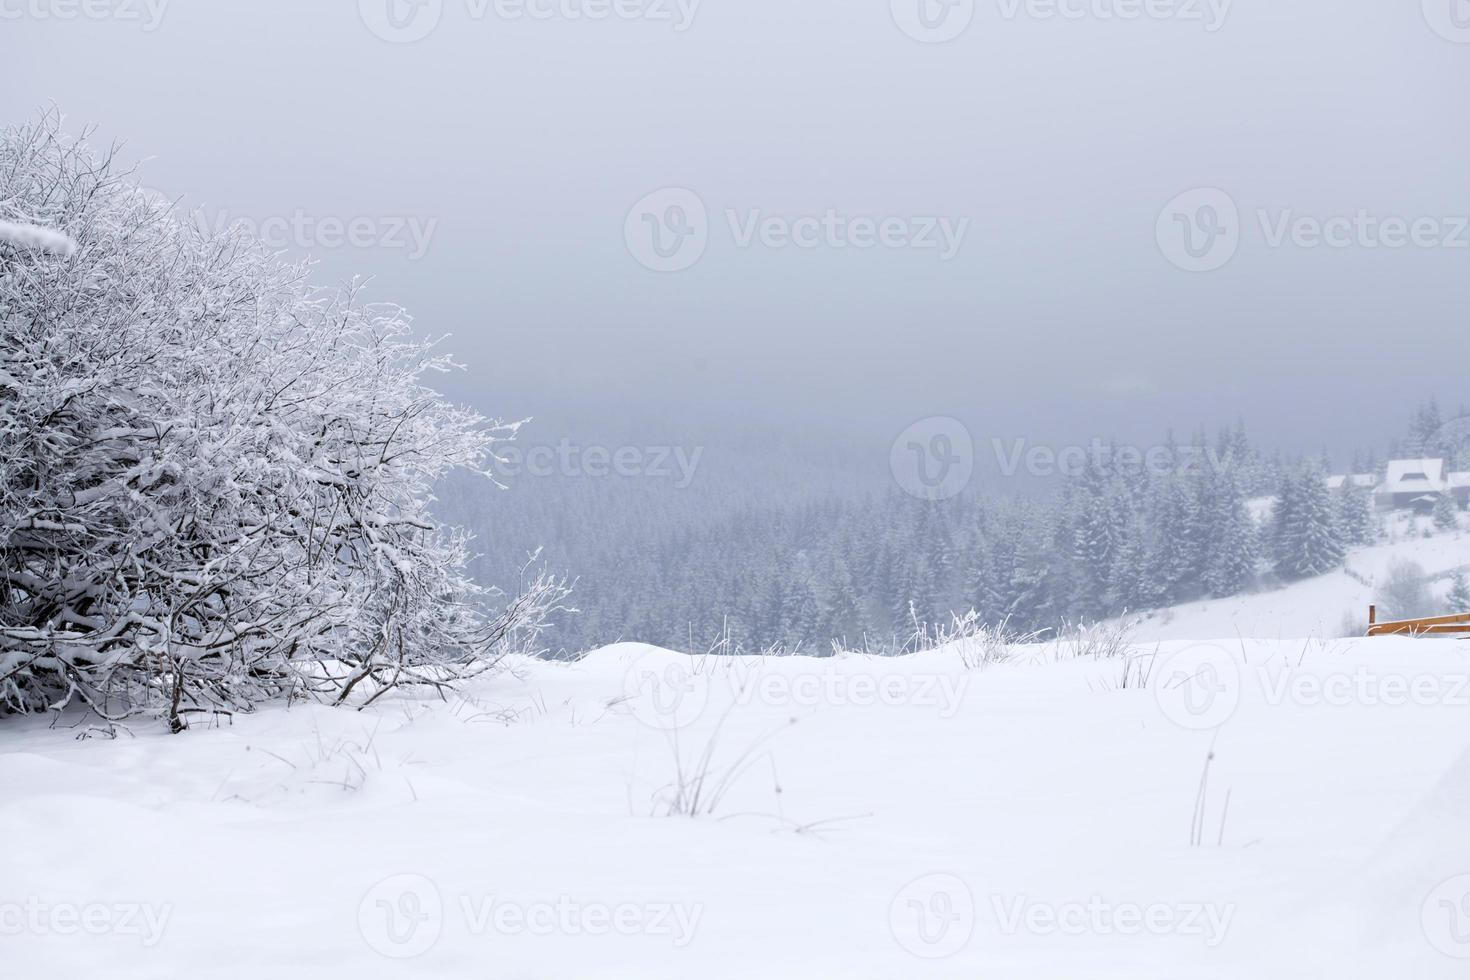 Fantastic winter landscape photo